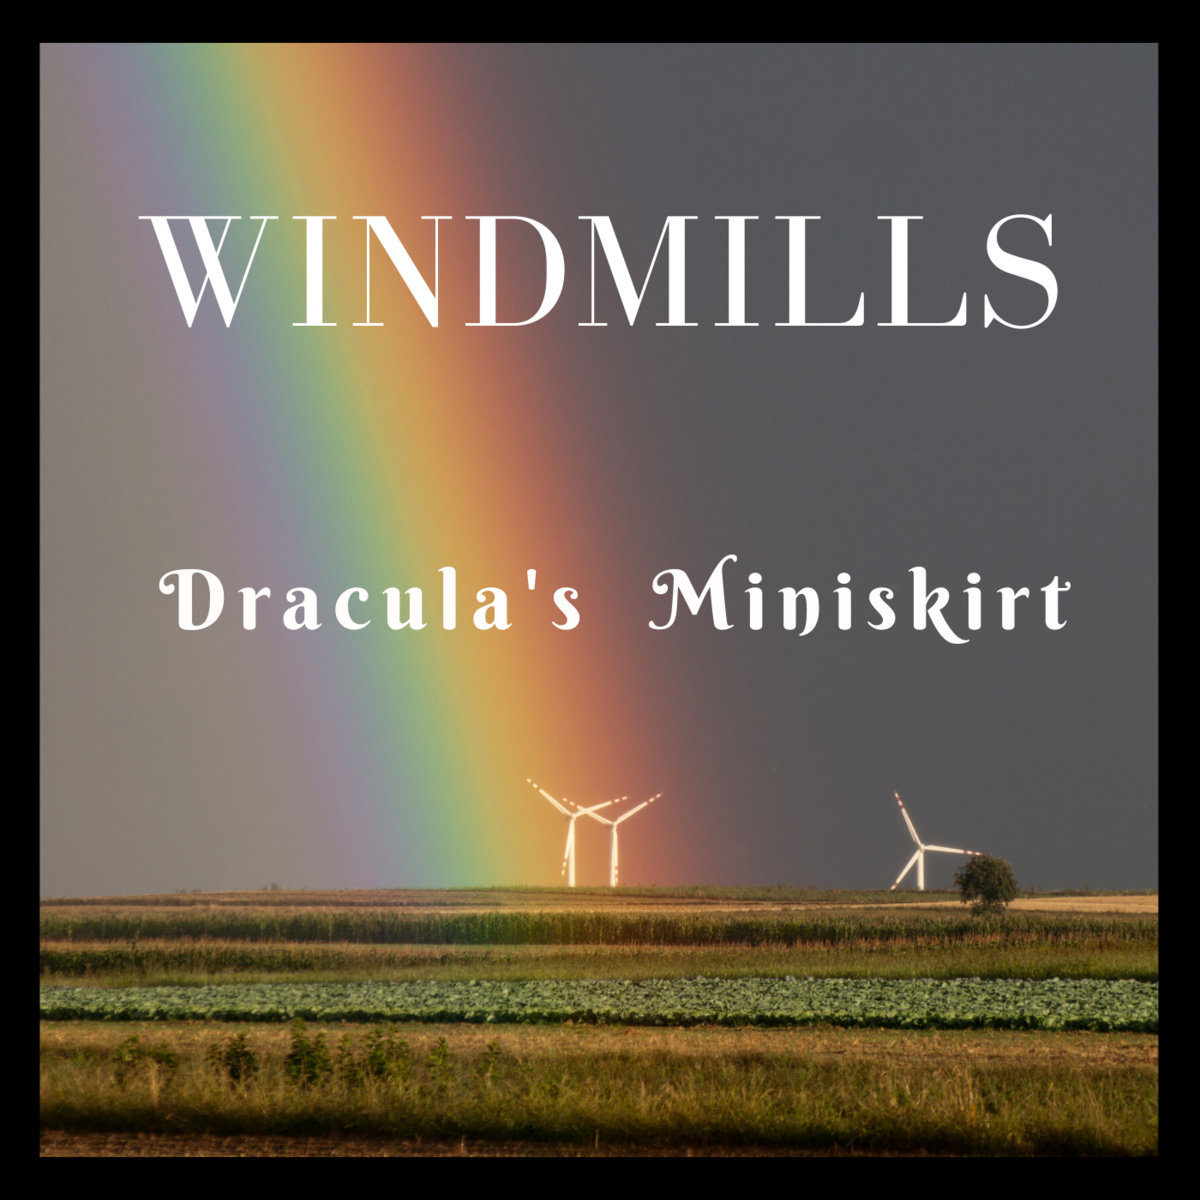 Windmills by Dracula's Miniskirt